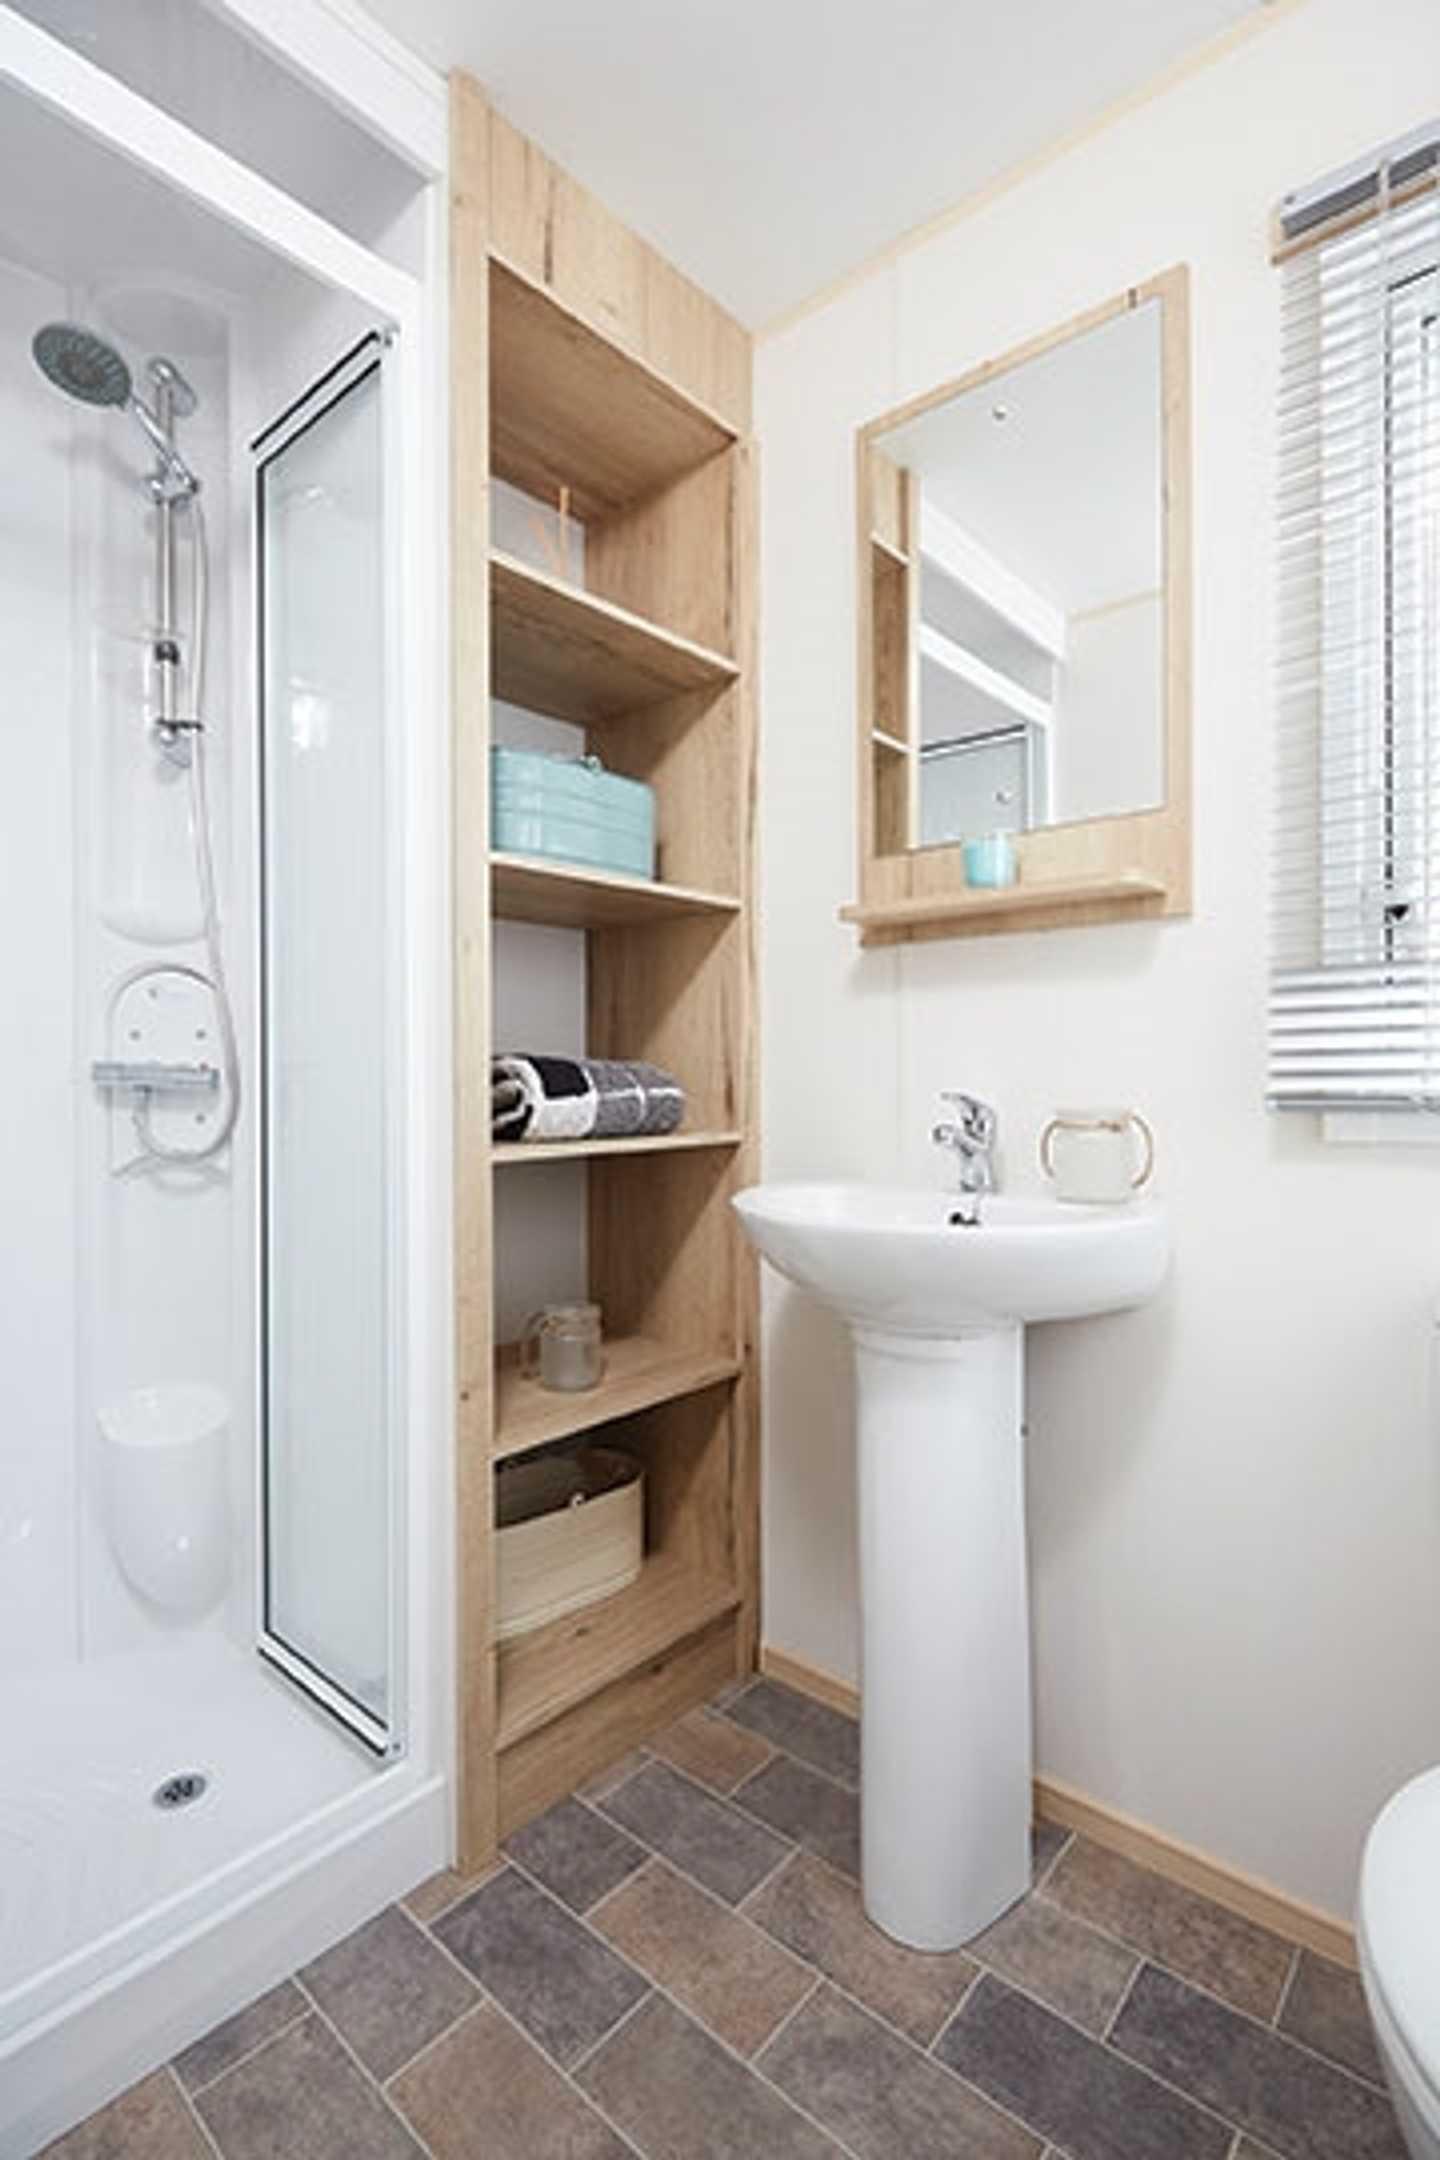 ABI Horizon bathroom